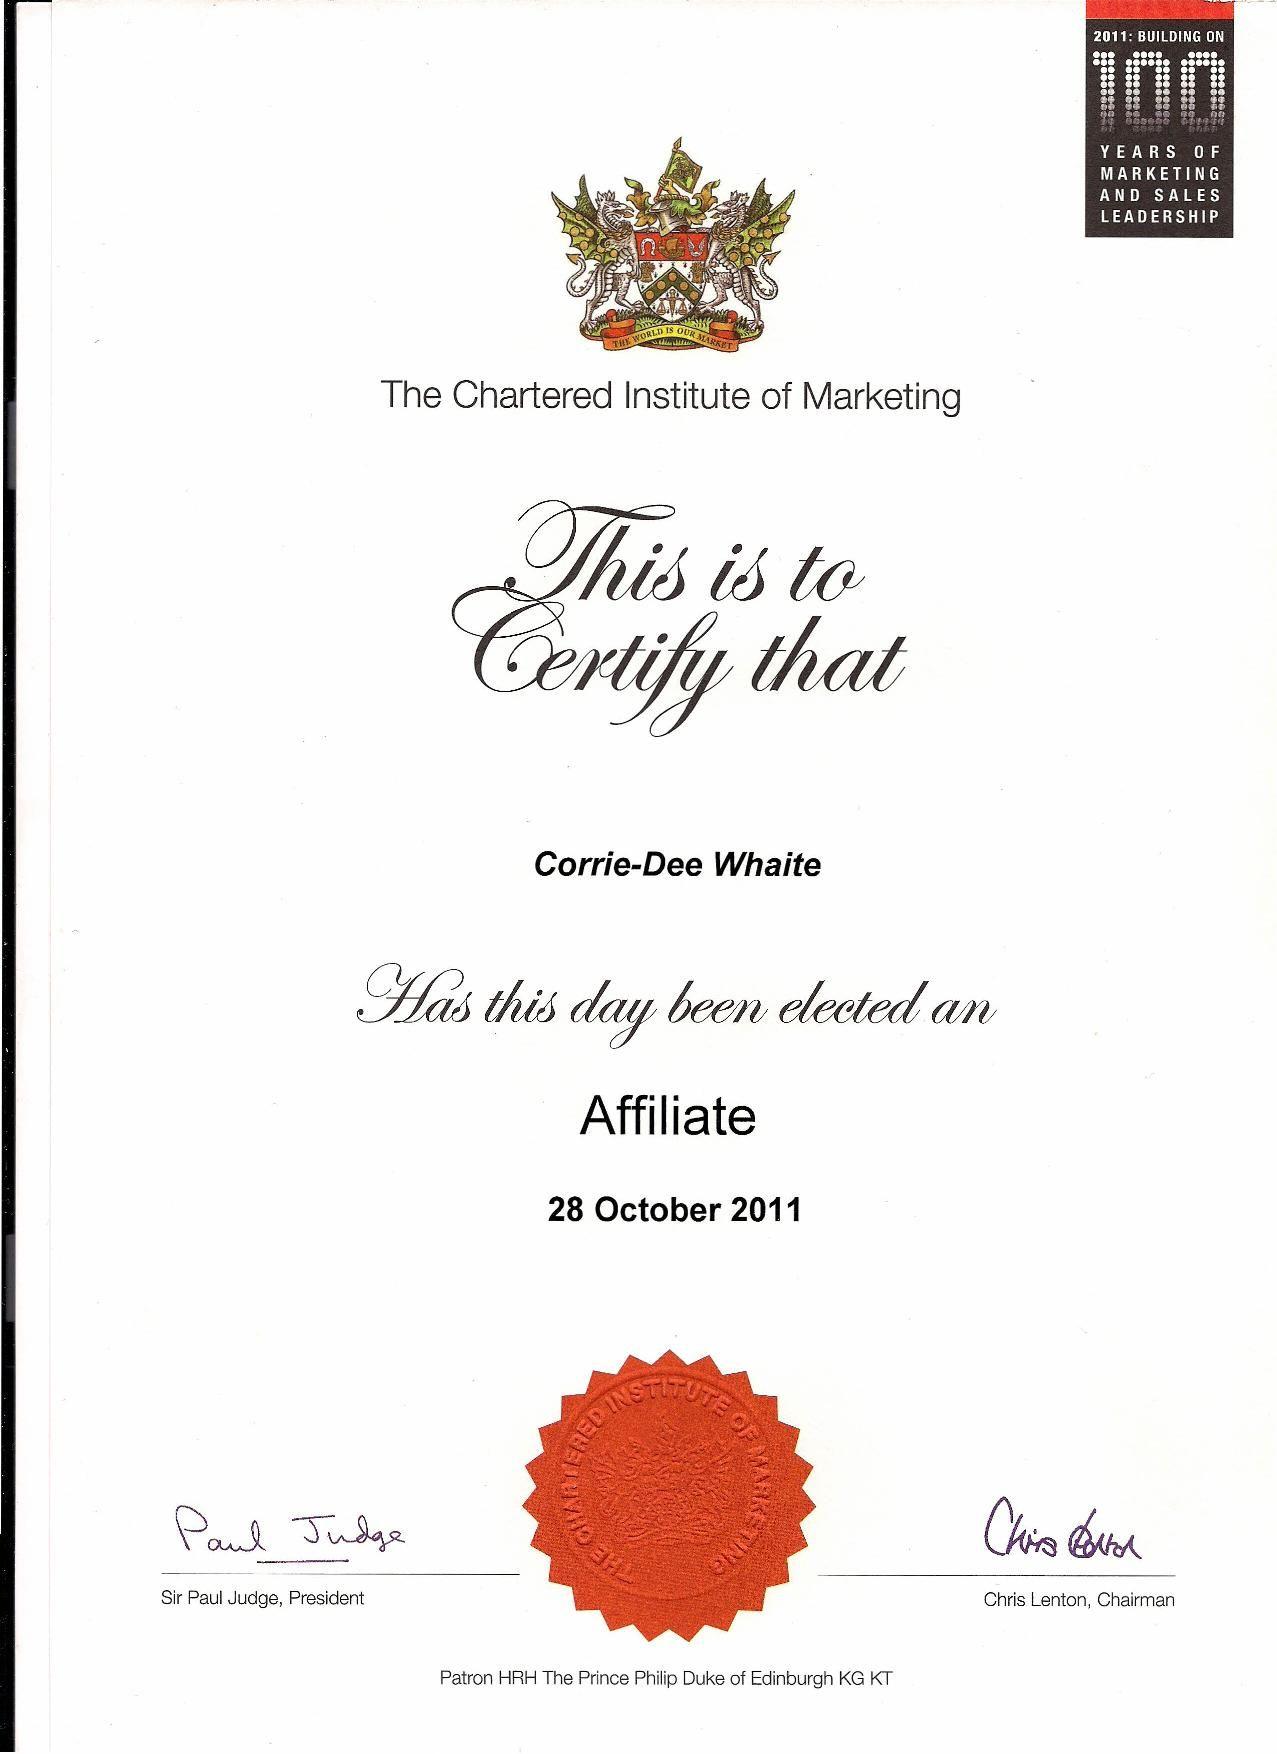 Acim Affiliate Member Of Chartered Institute Of Marketing Cpd